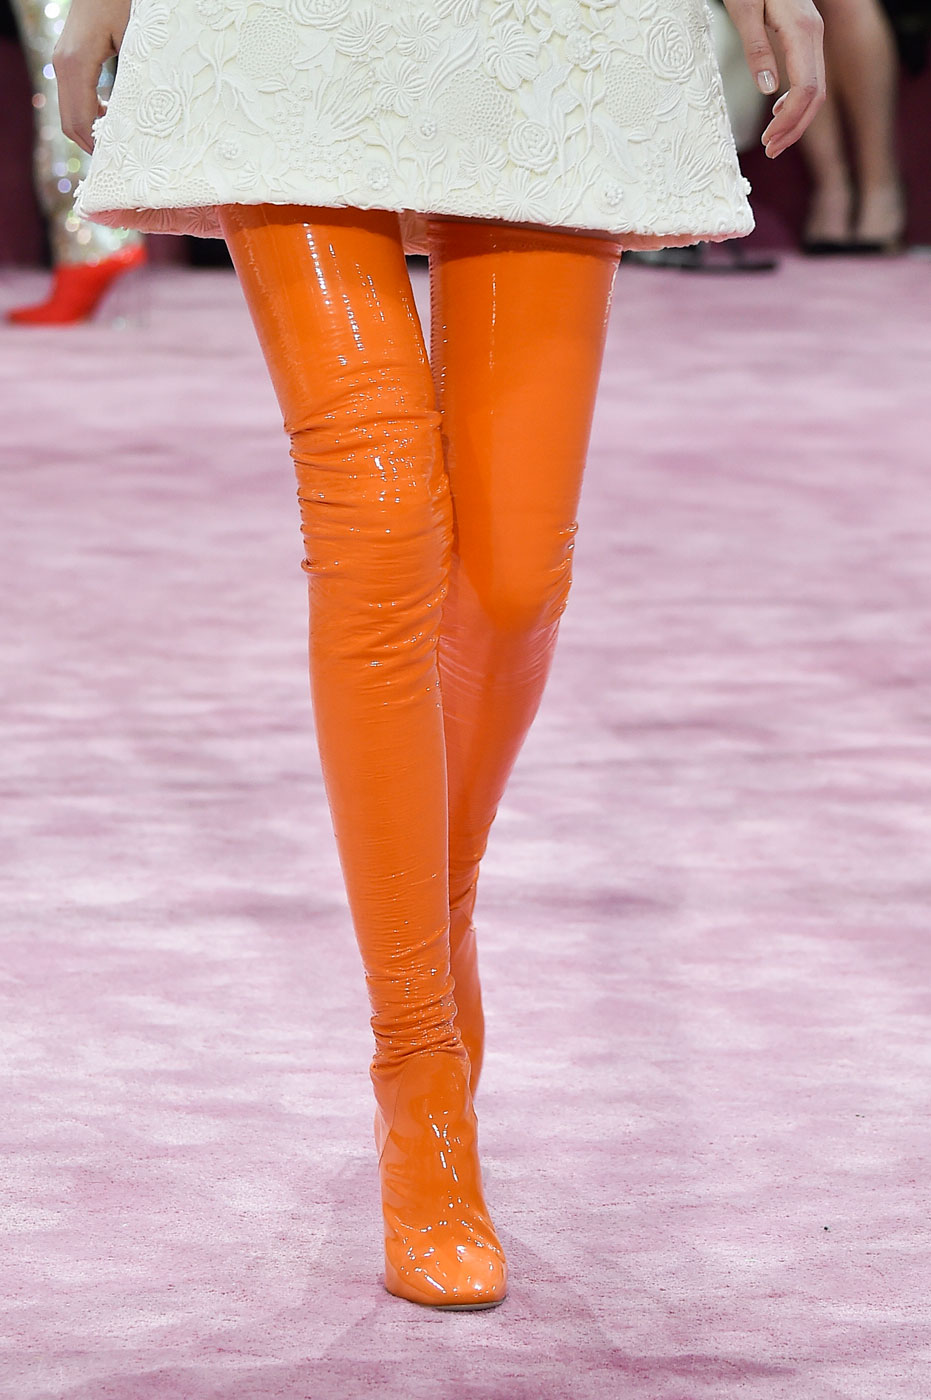 Christian-Dior-fashion-runway-show-close-ups-haute-couture-paris-spring-summer-2015-the-impression-090